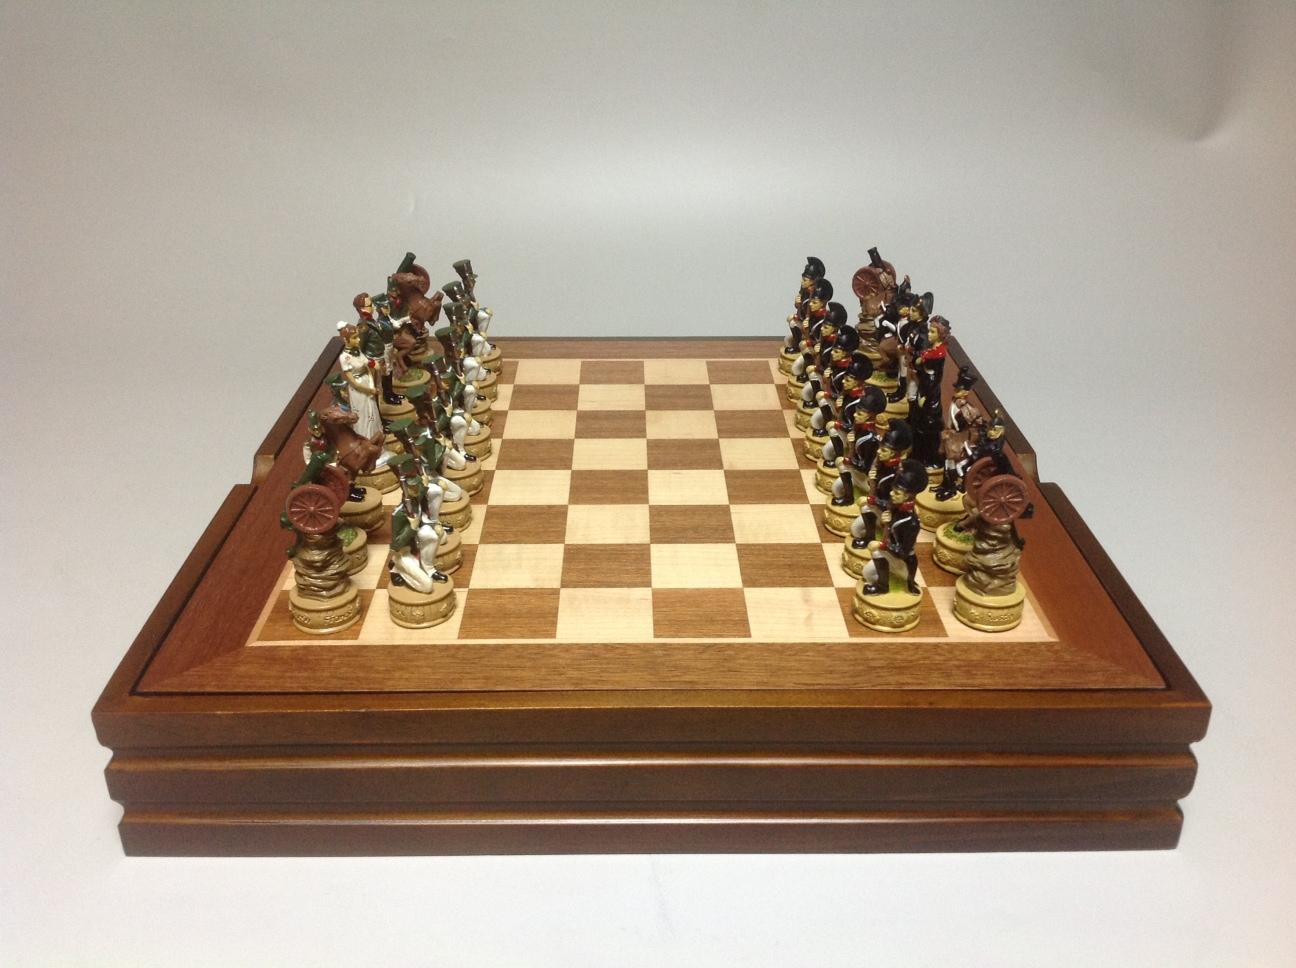 Шахматный ларец Наполеон и Кутузов, металл